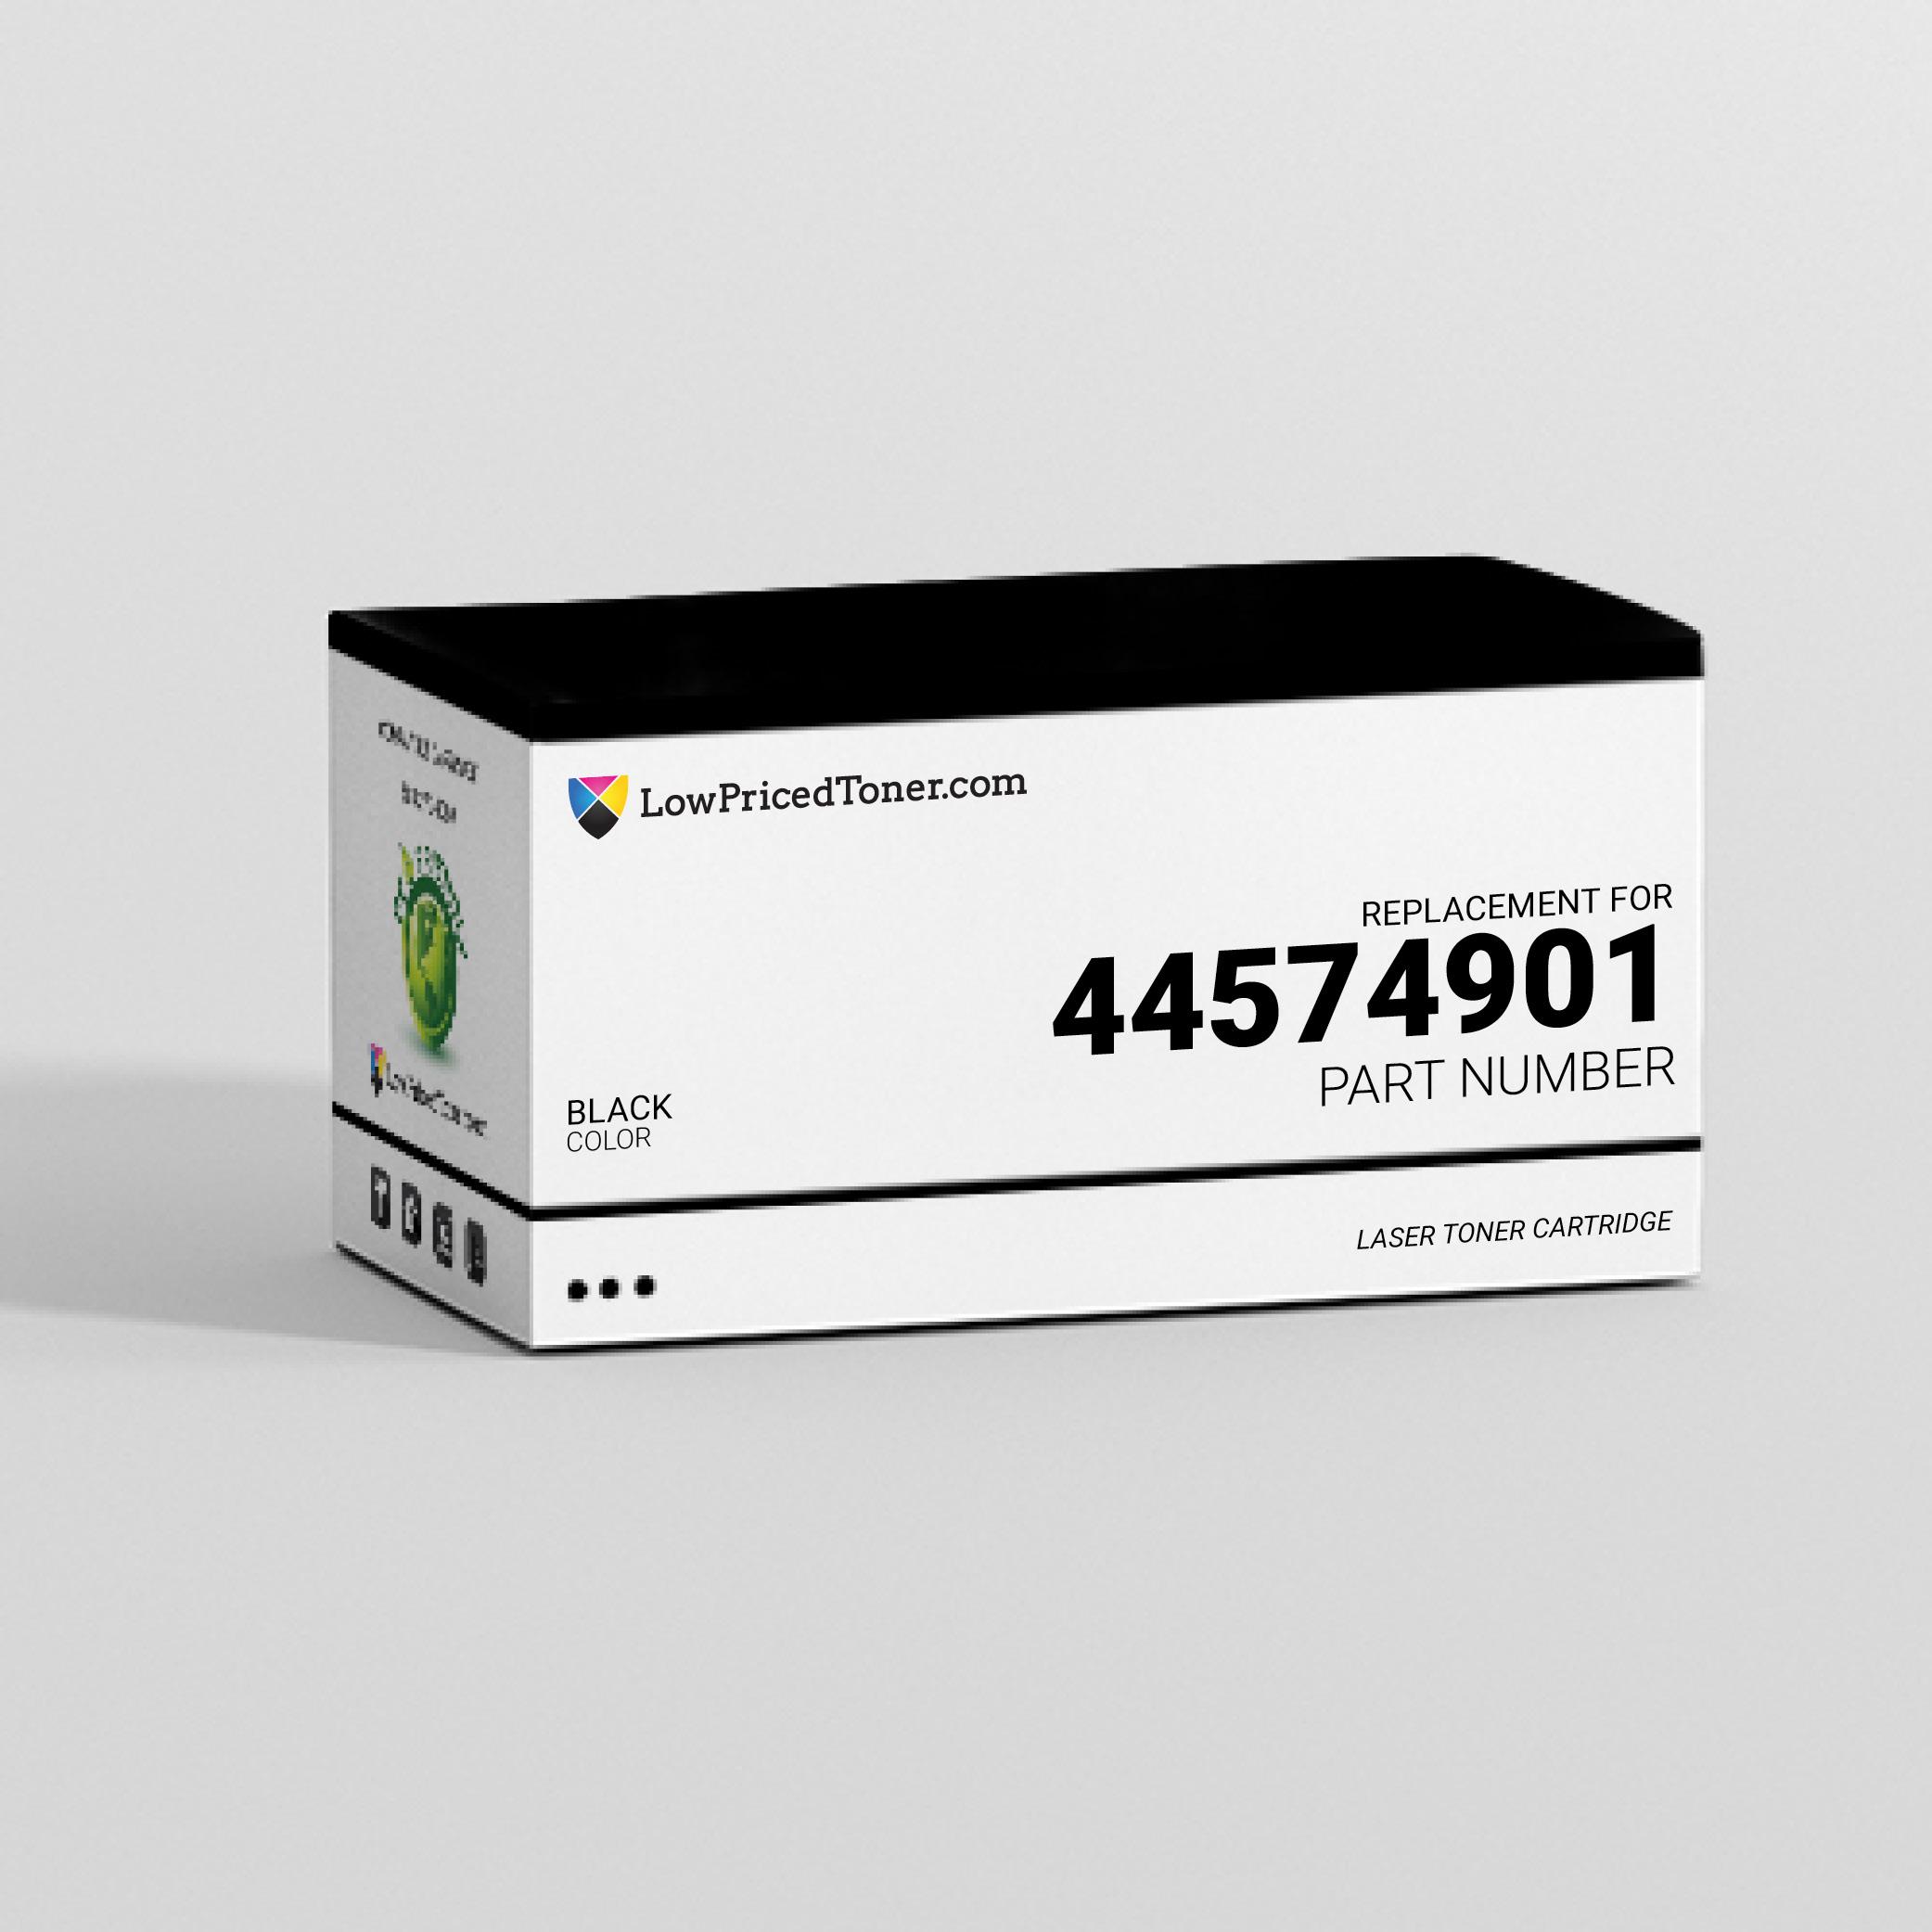 Okidata 44574901 Compatible Black Laser Toner Cartridge